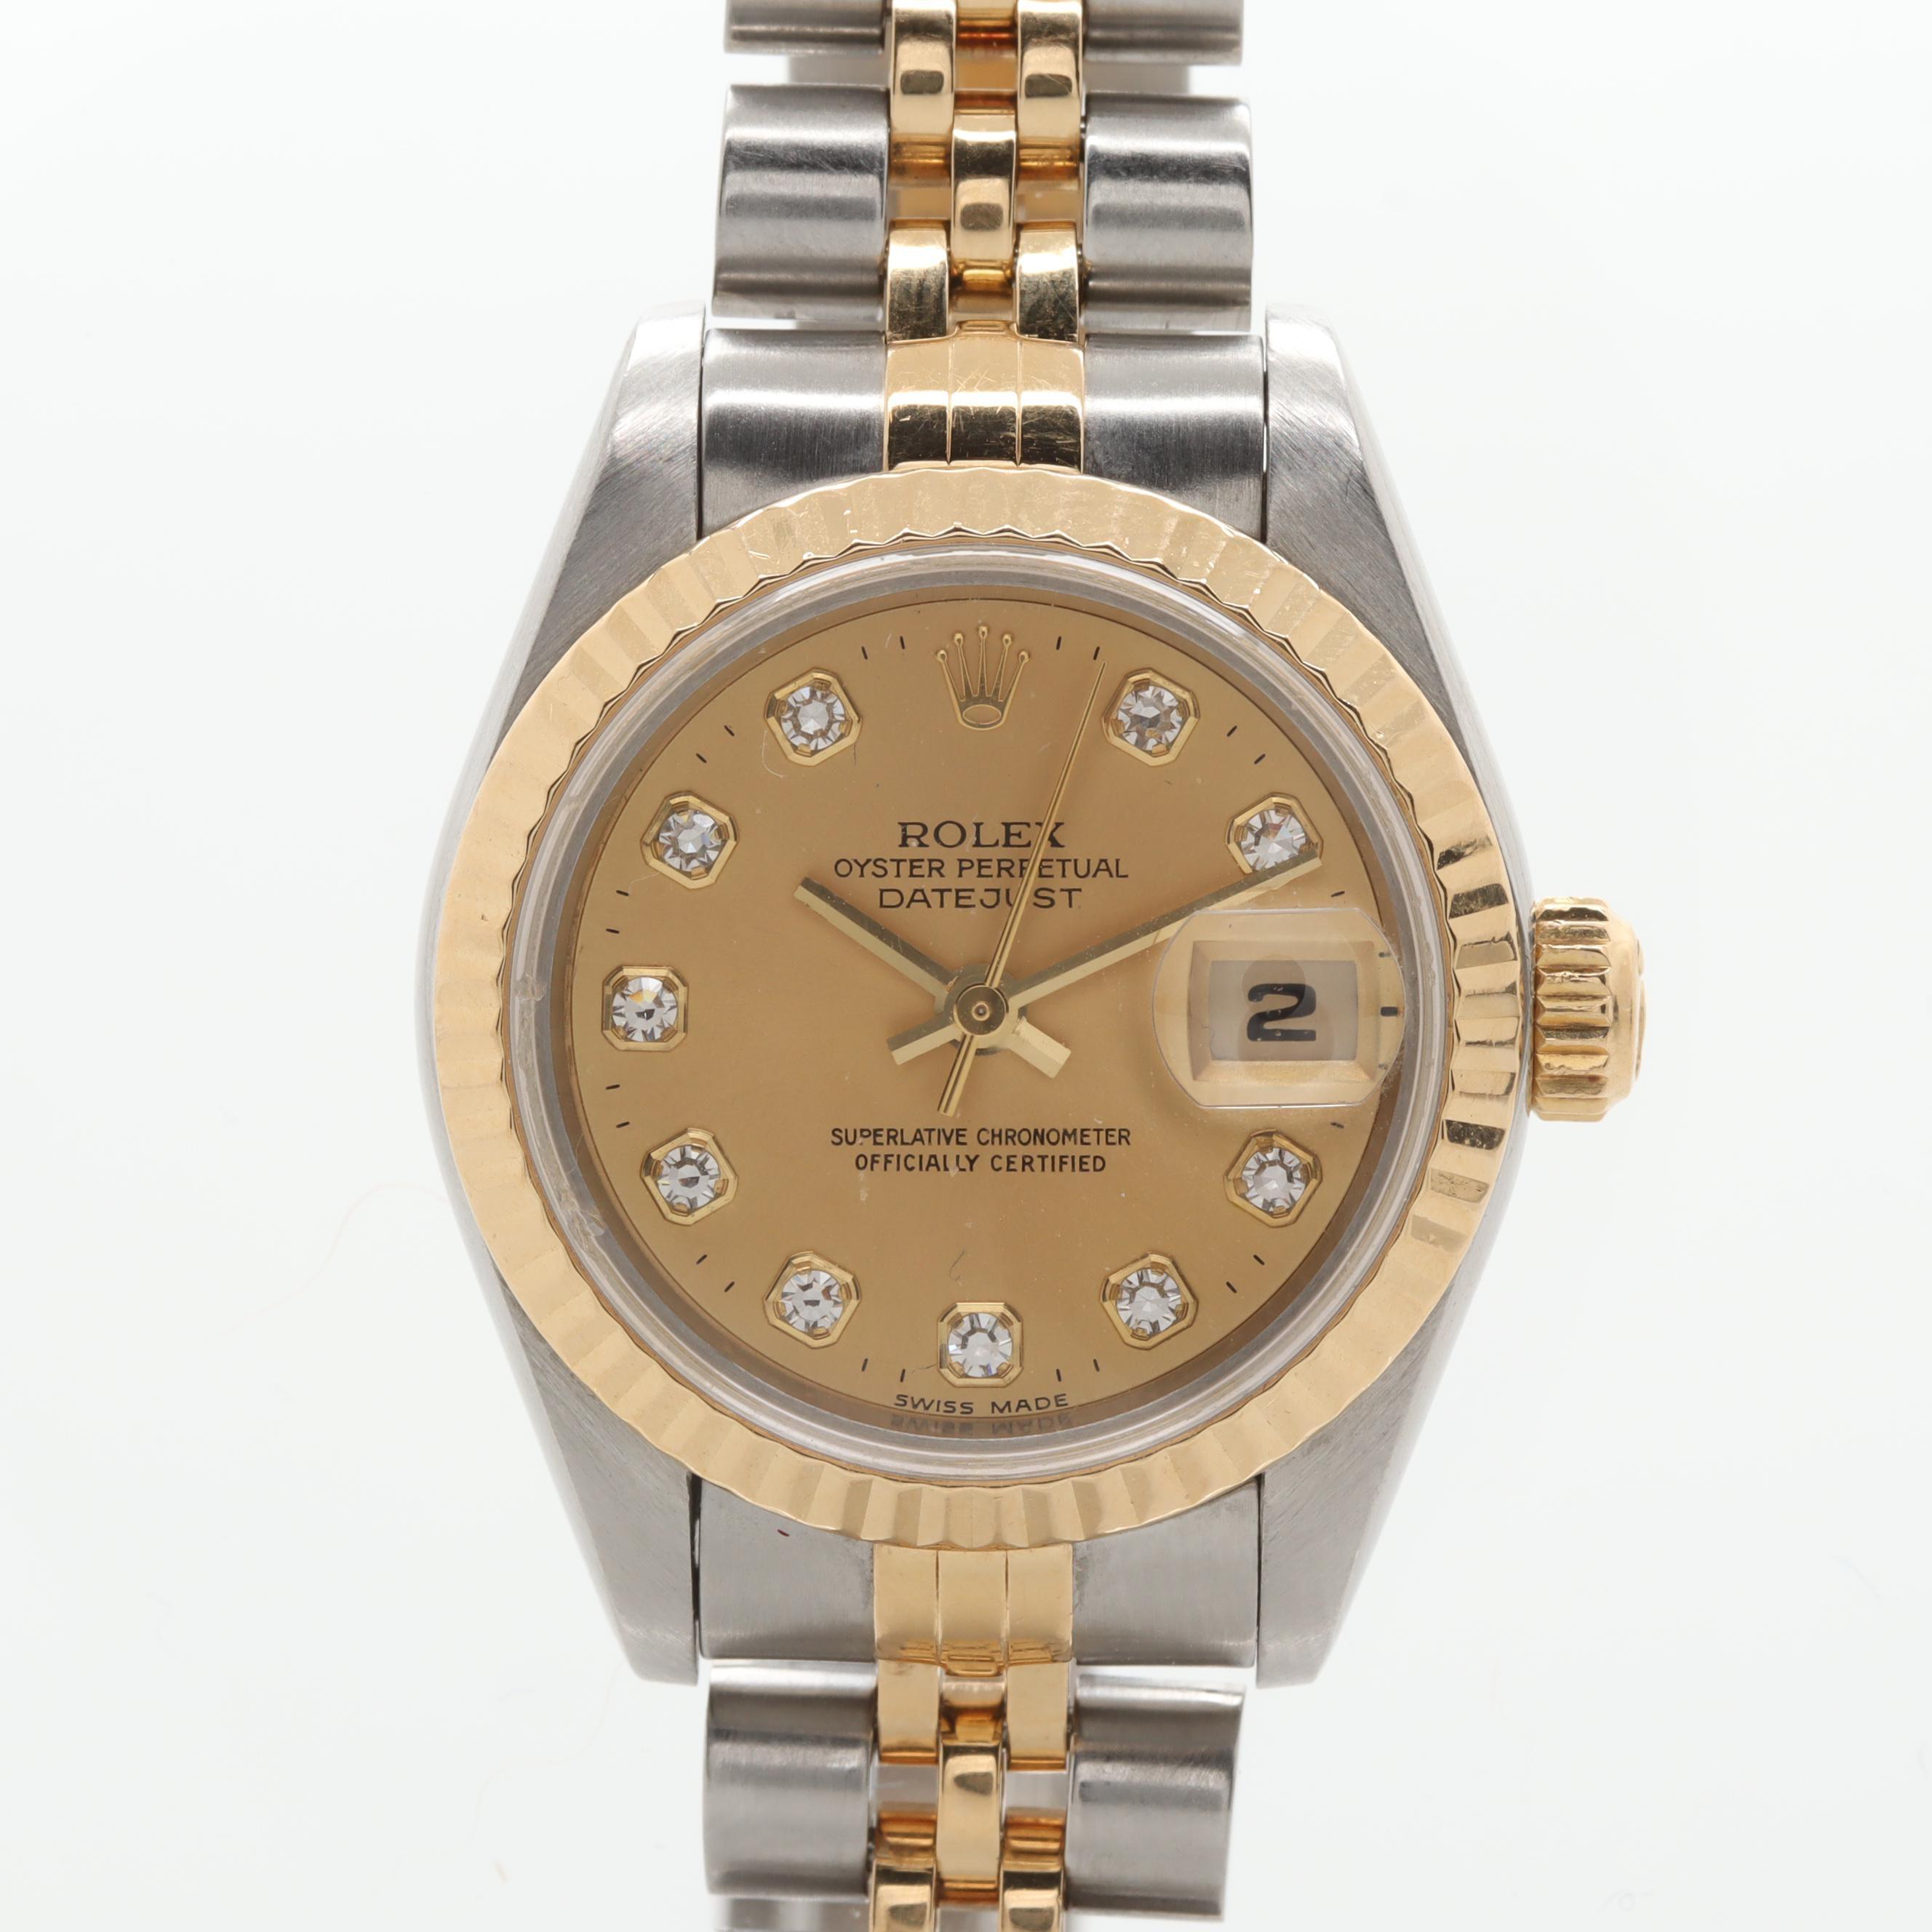 Circa 1994 Rolex 18K Yellow Gold and Stainless Steel Diamond Wristwatch